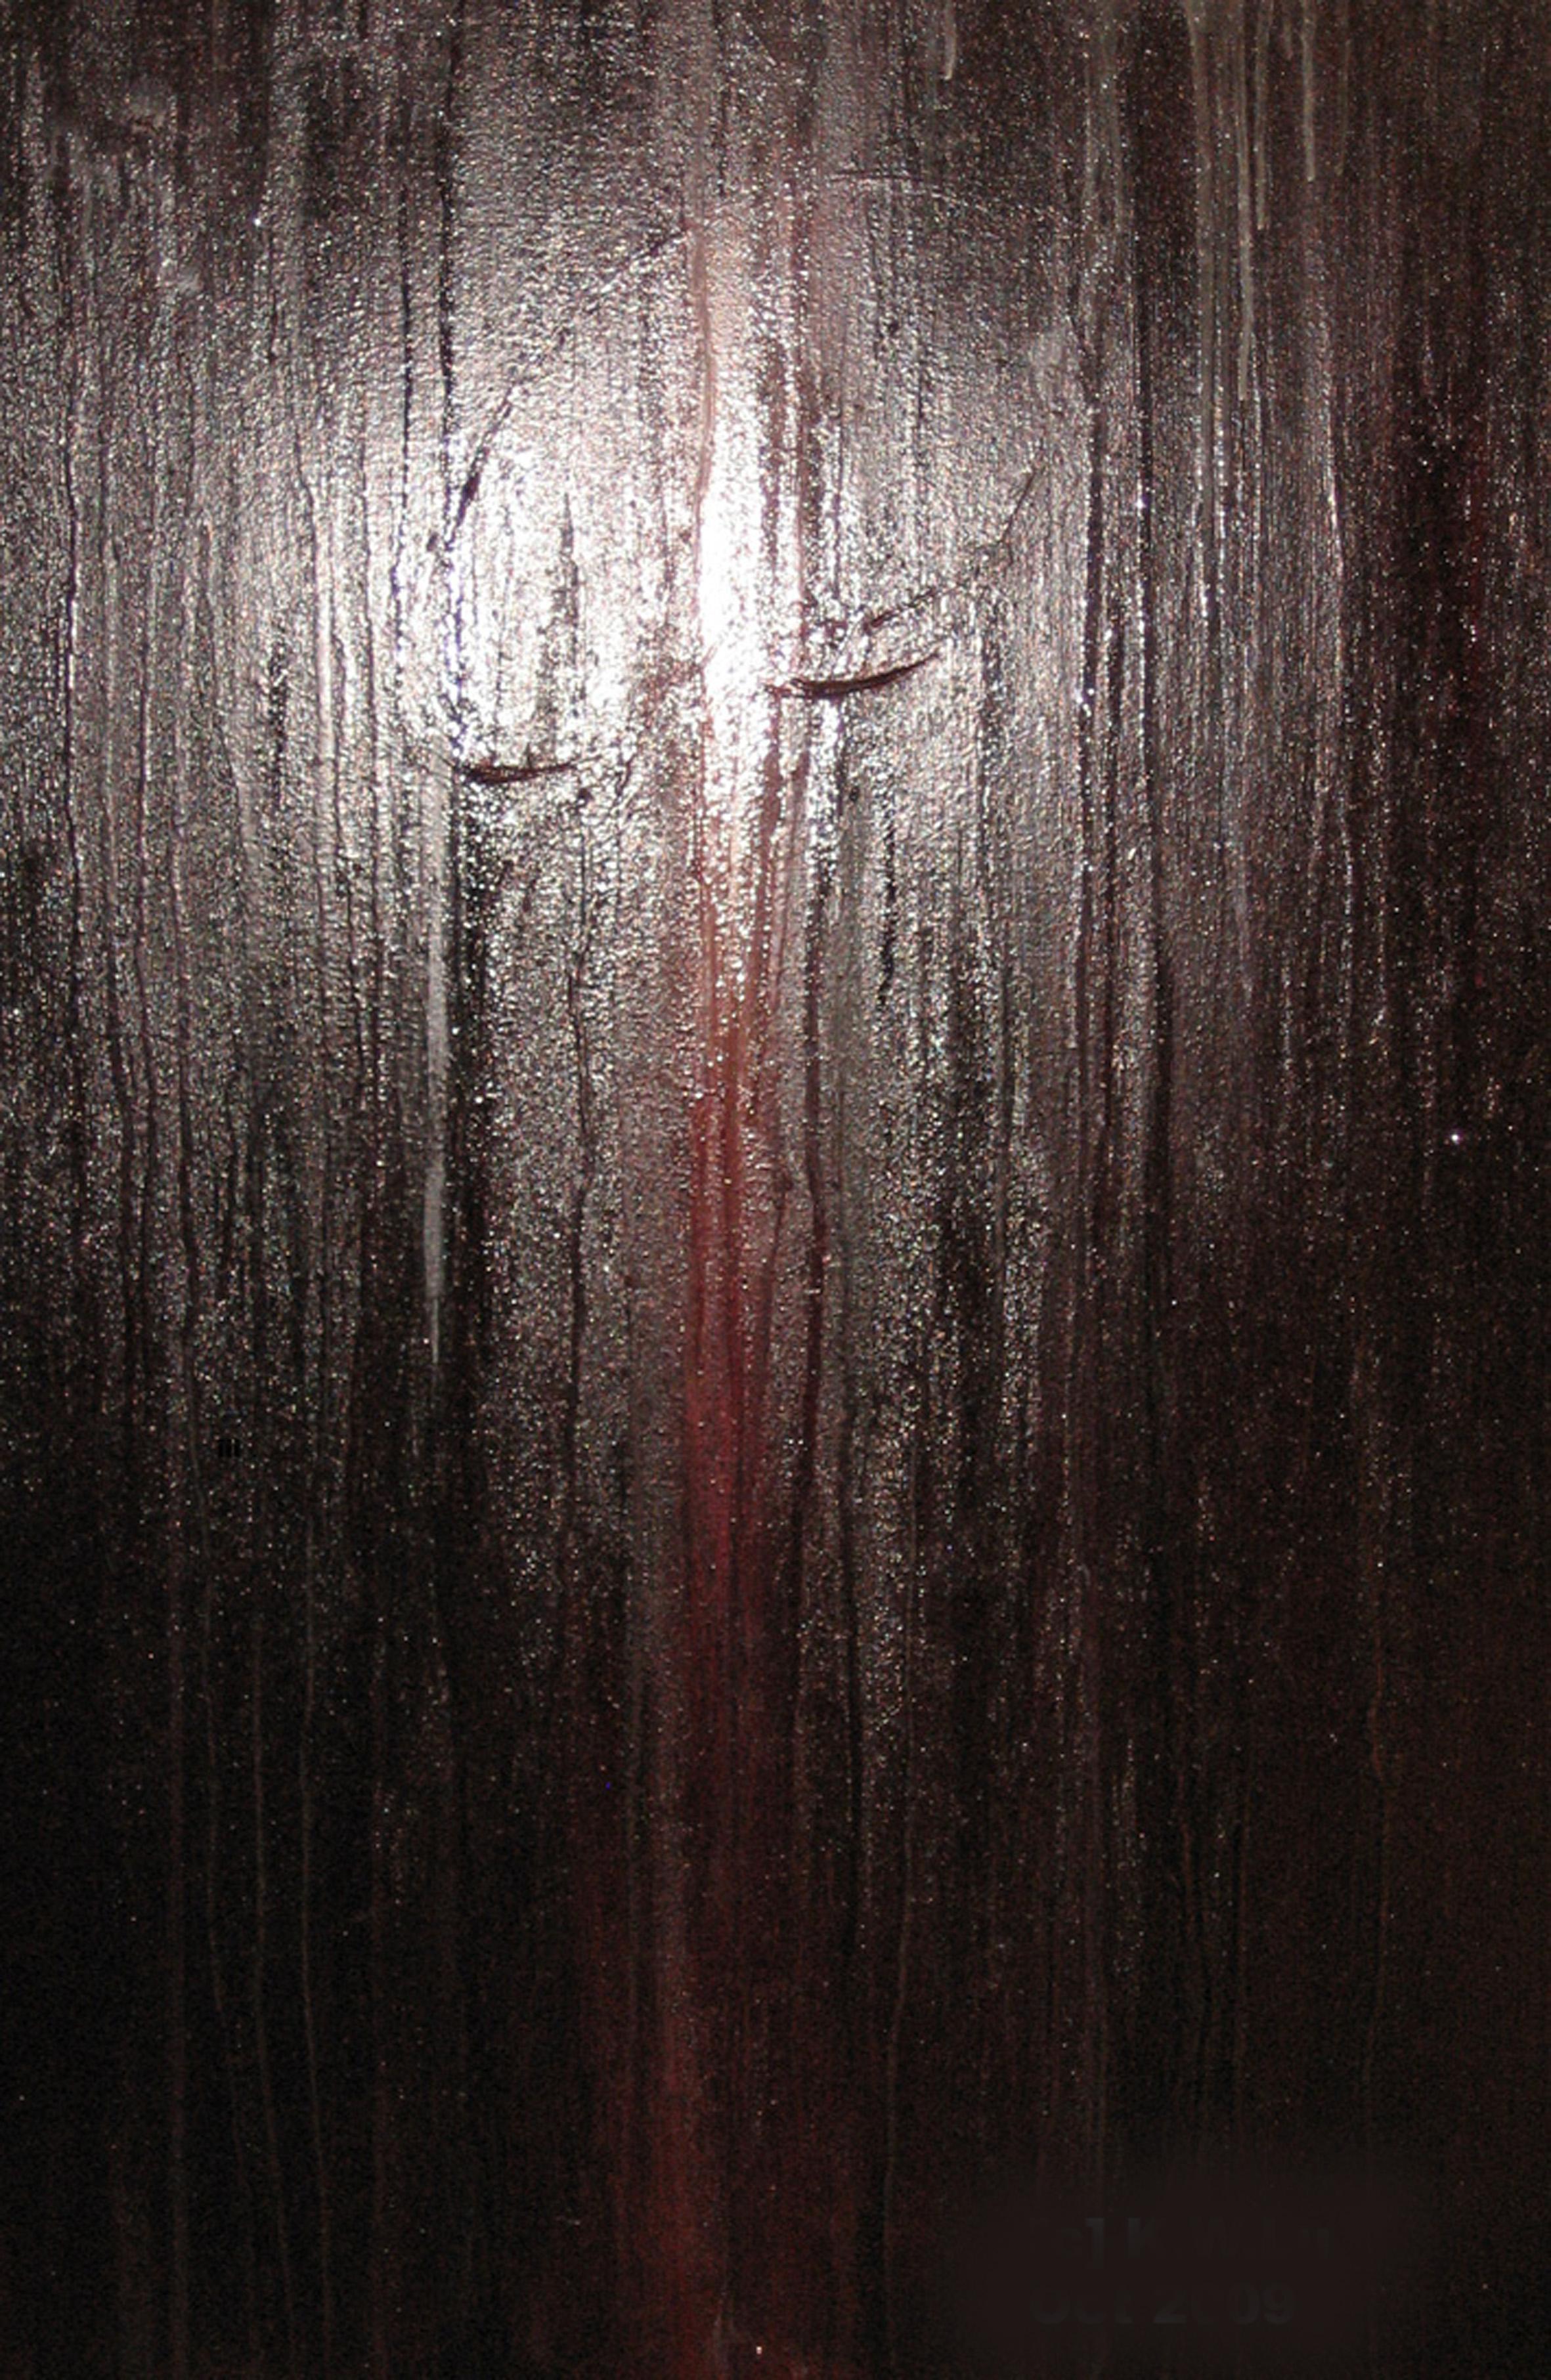 Virgin X 03-09 (Dripping Fluid Series 2003 - 2009)